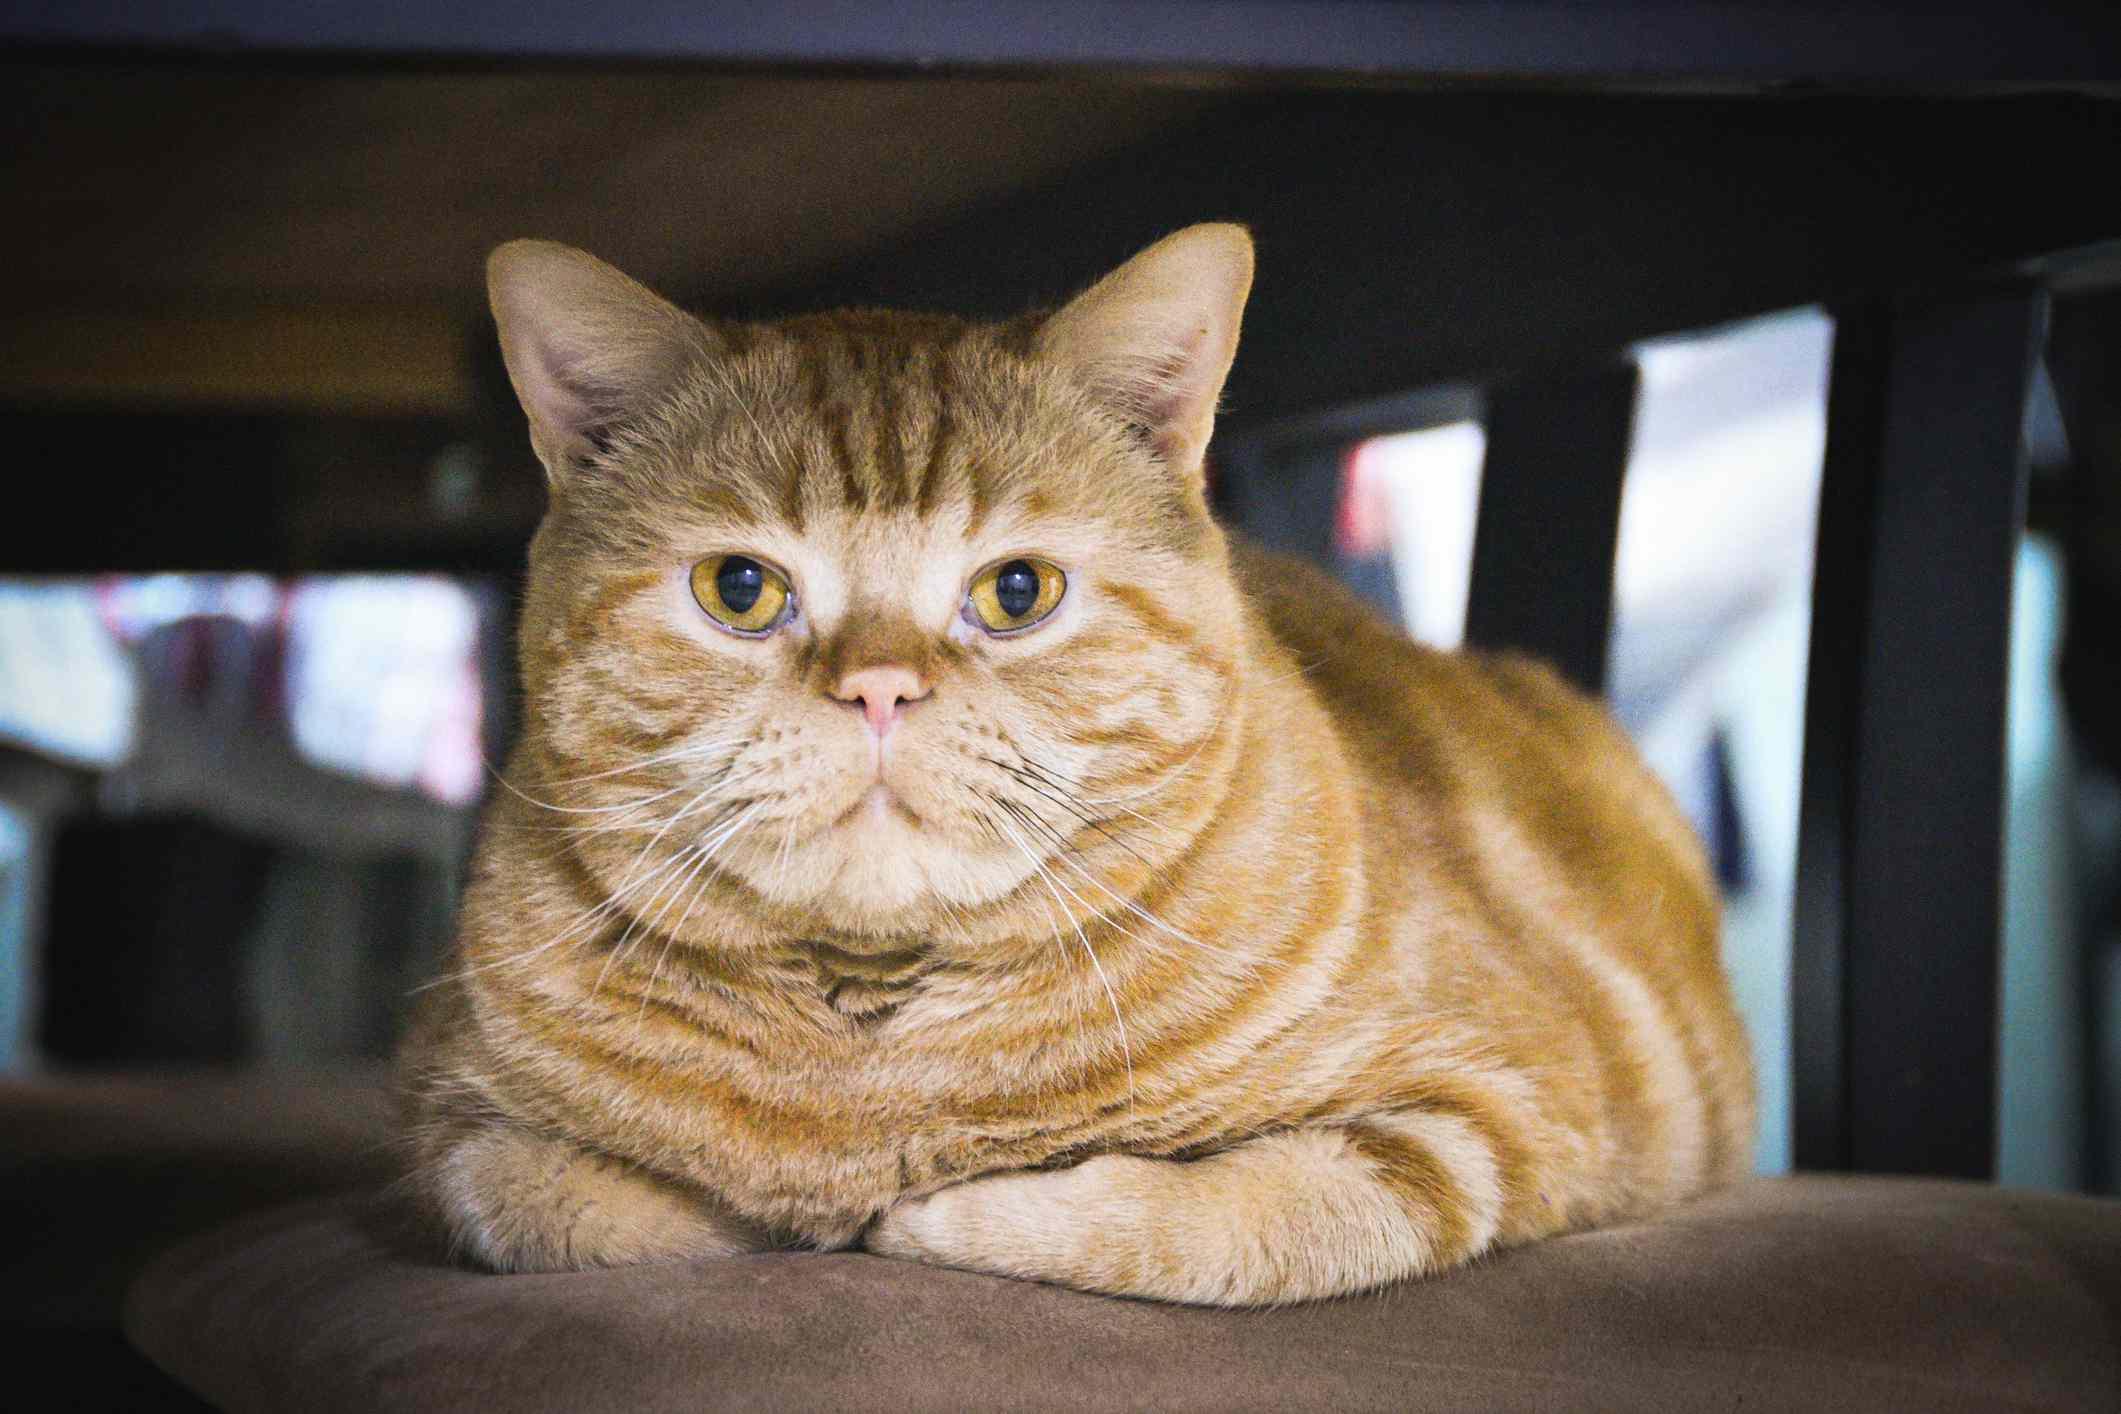 American wirehair cat lying down